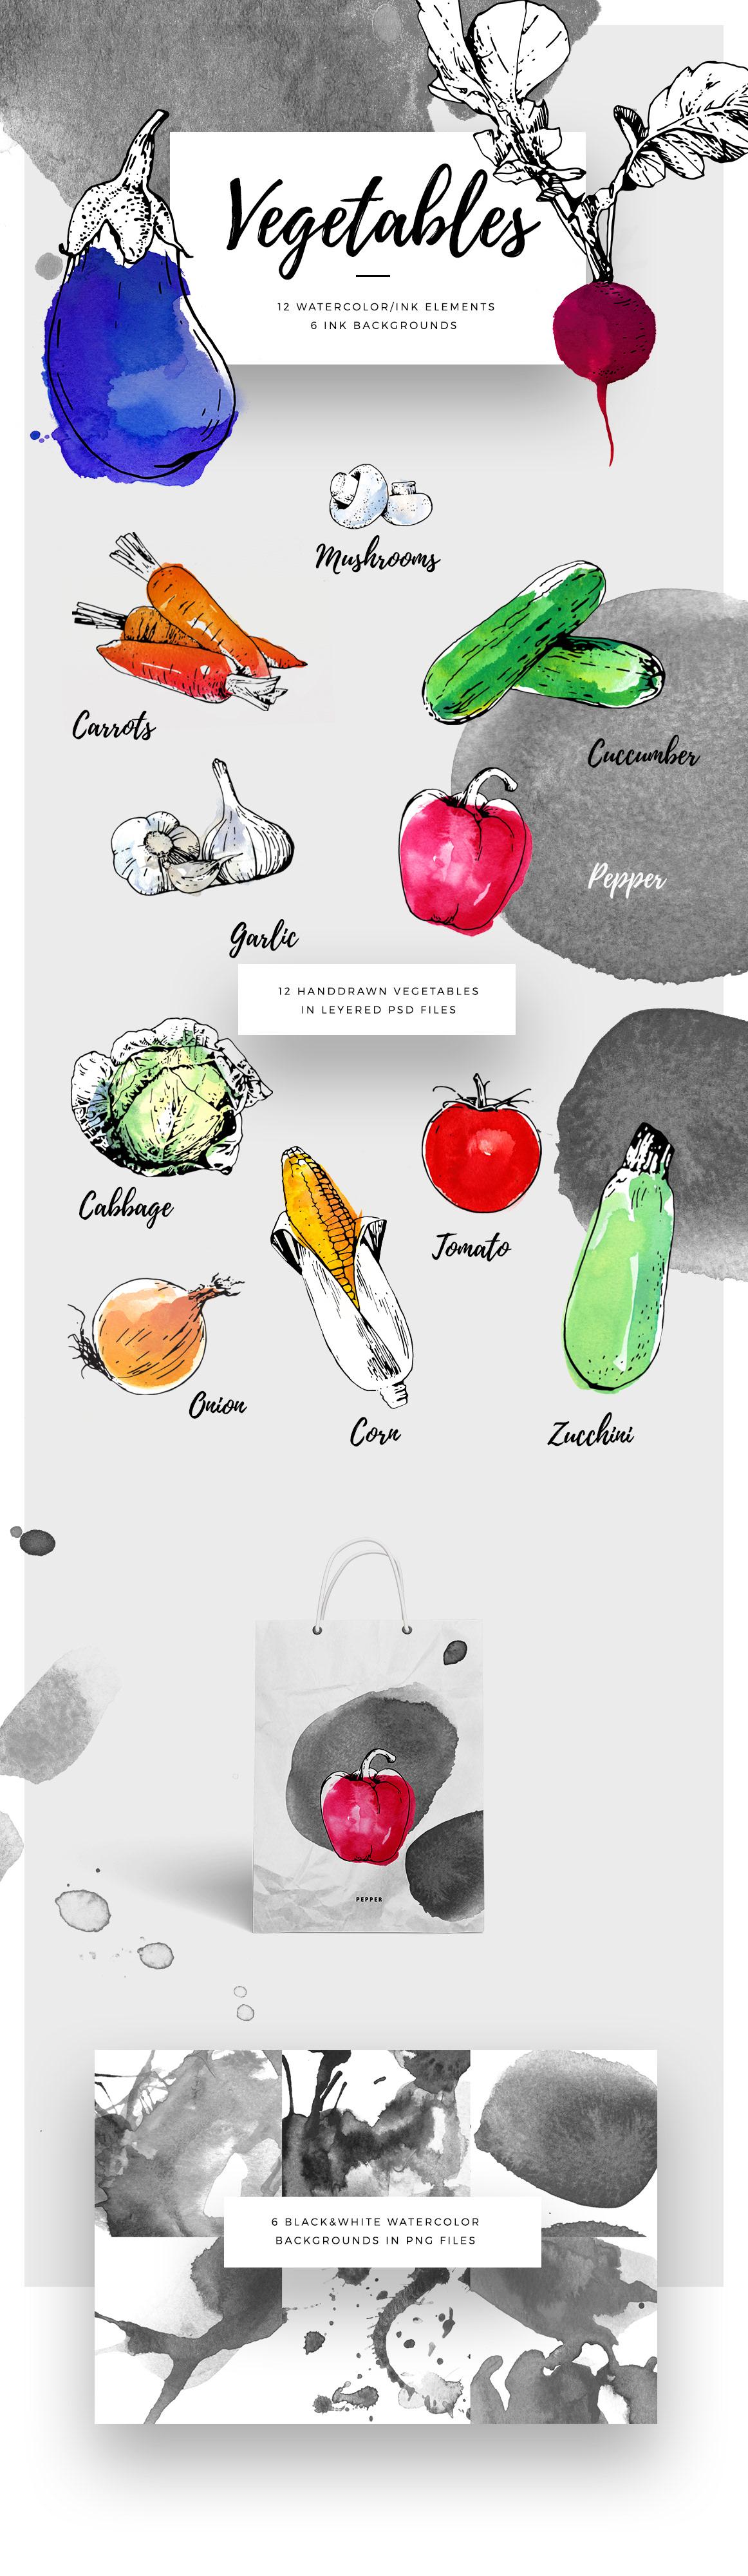 ink vegetables vegetable graphic watercolor vector